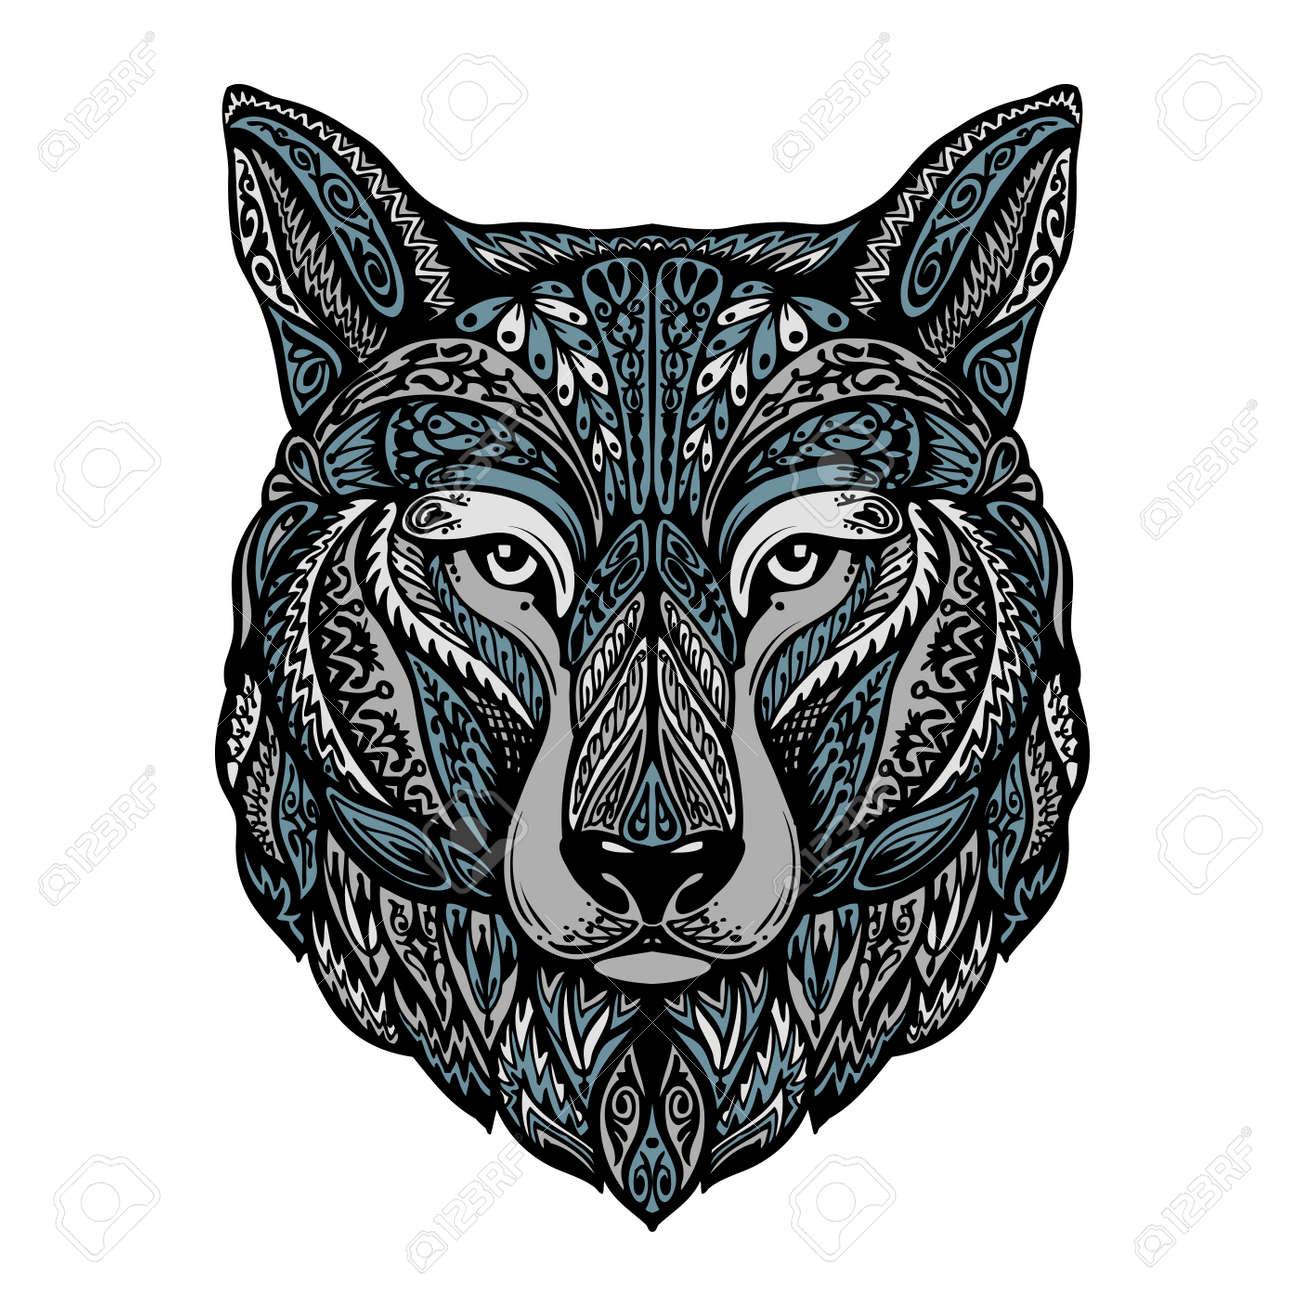 Ethnic ornamented wolf, dog, werewolf Vector illustration - 62977578